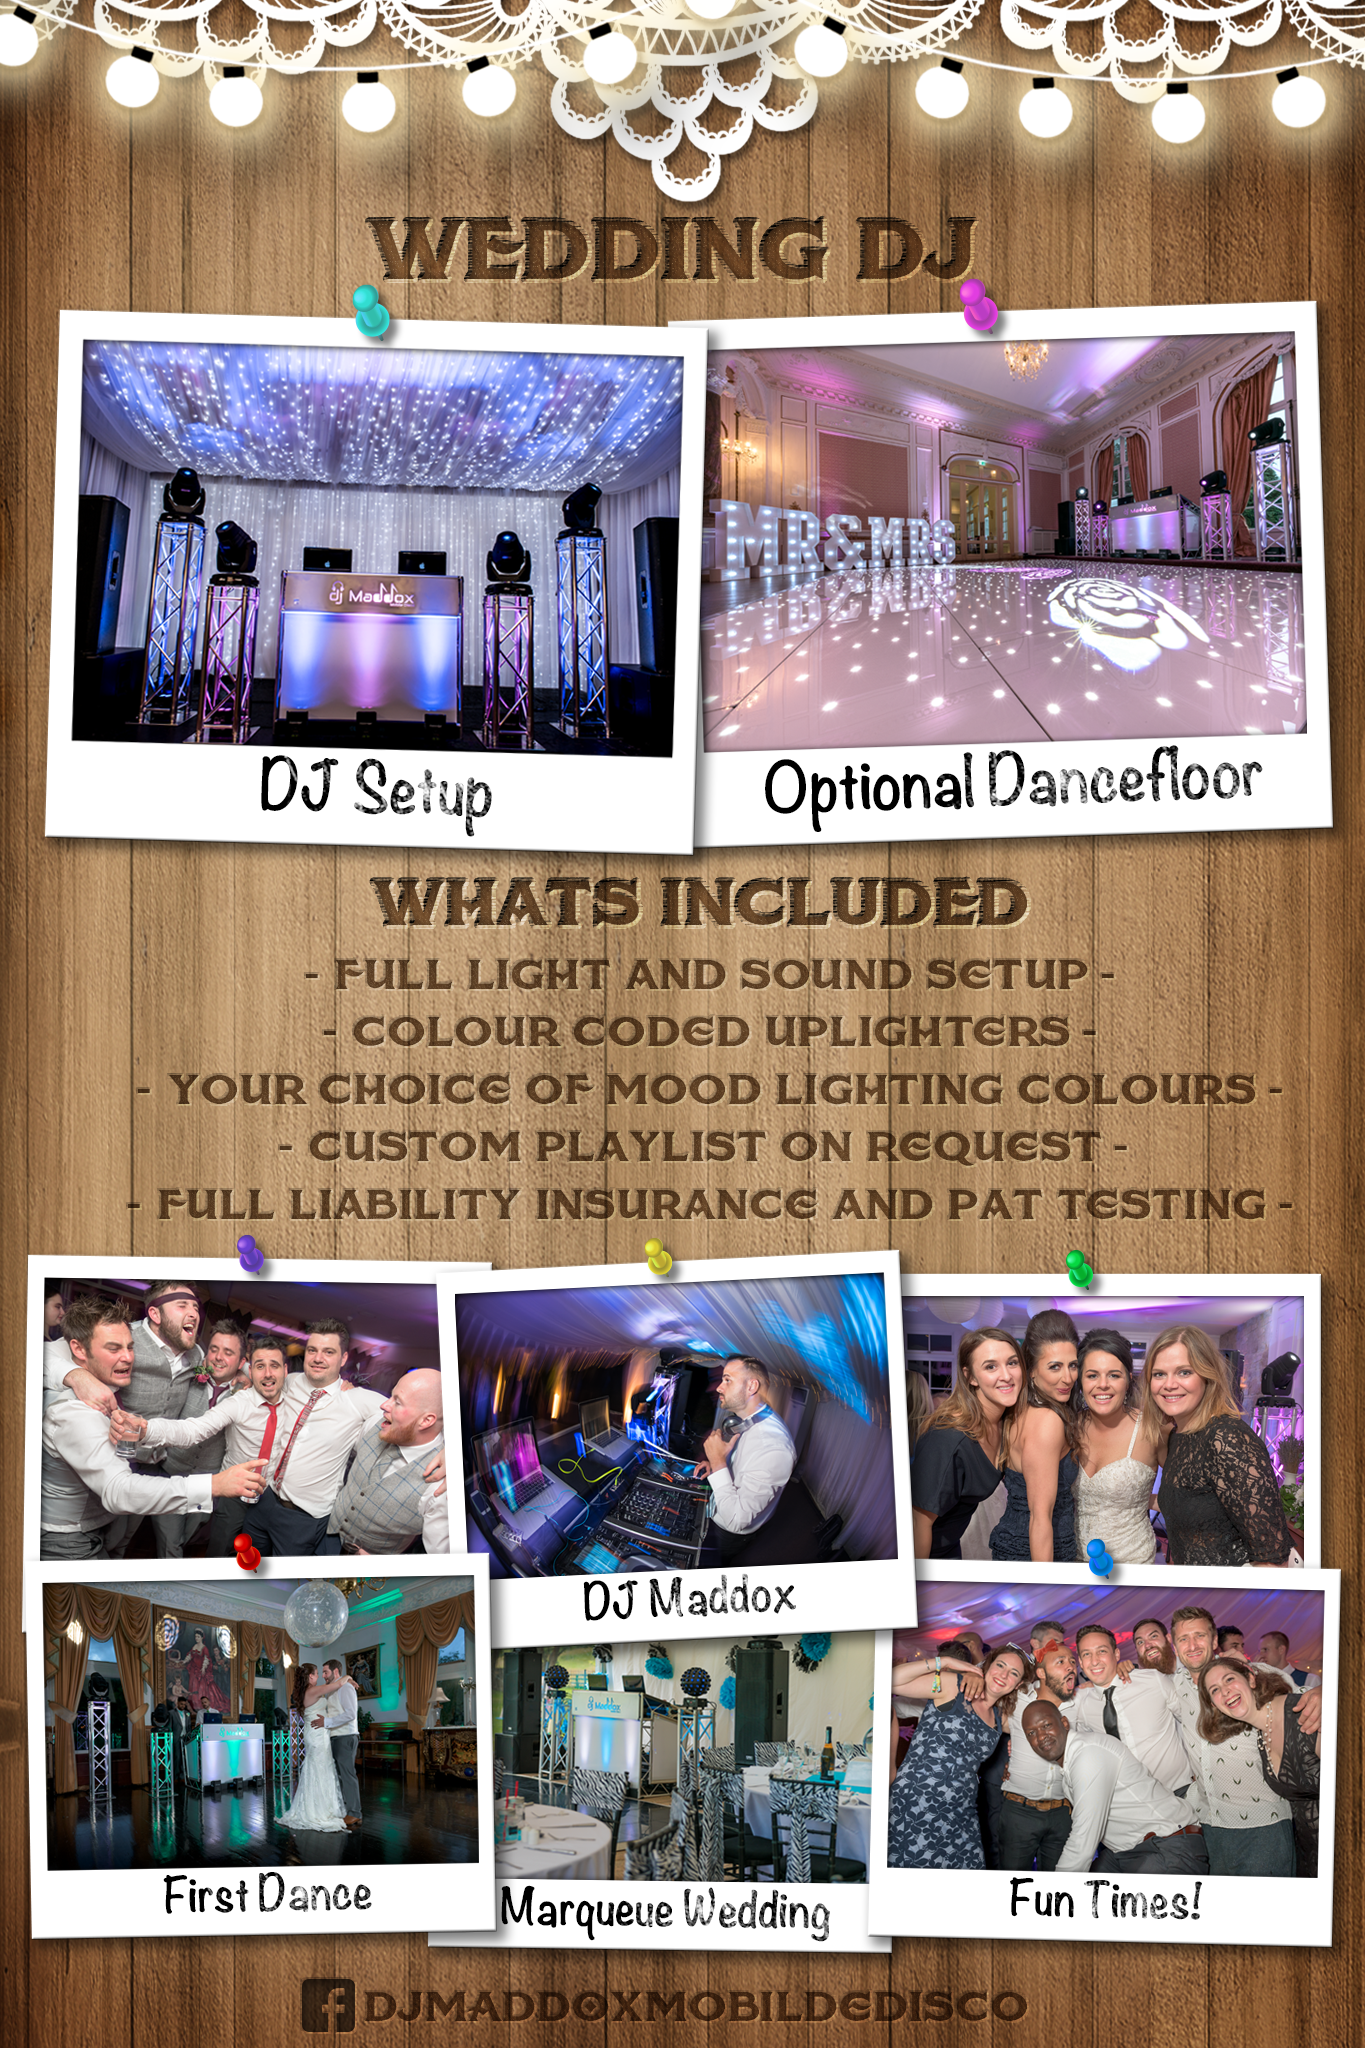 Wedding DJ Package Poster - DJ Maddox Mobile Disco & Wedding DJ